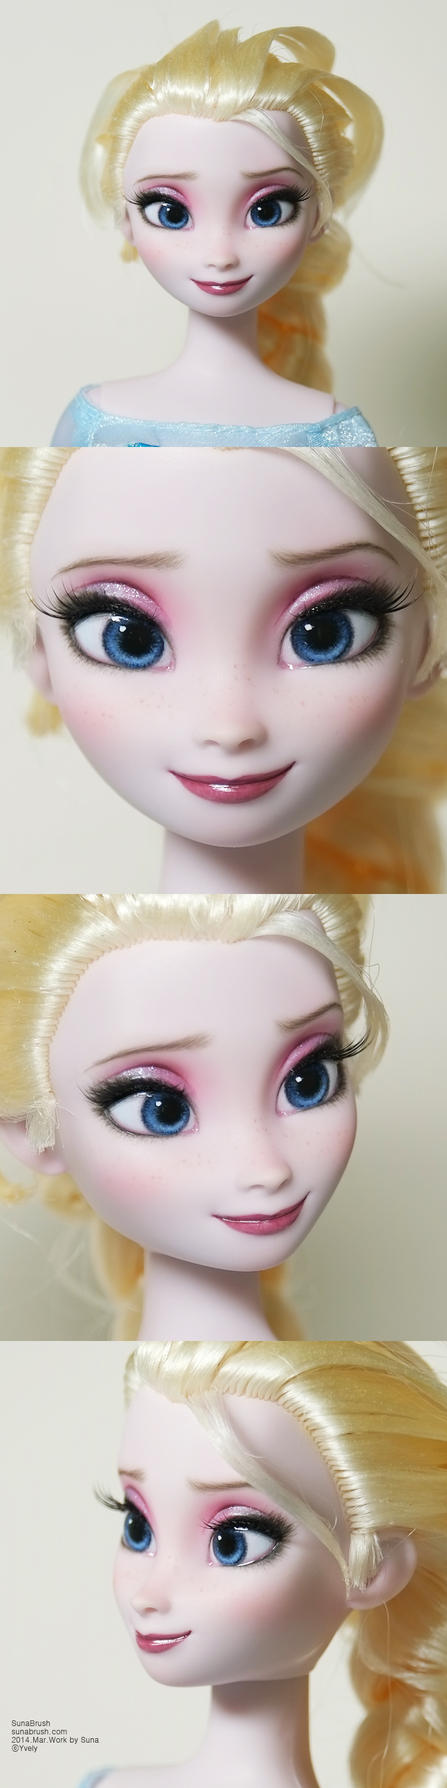 Elsa by Yvely